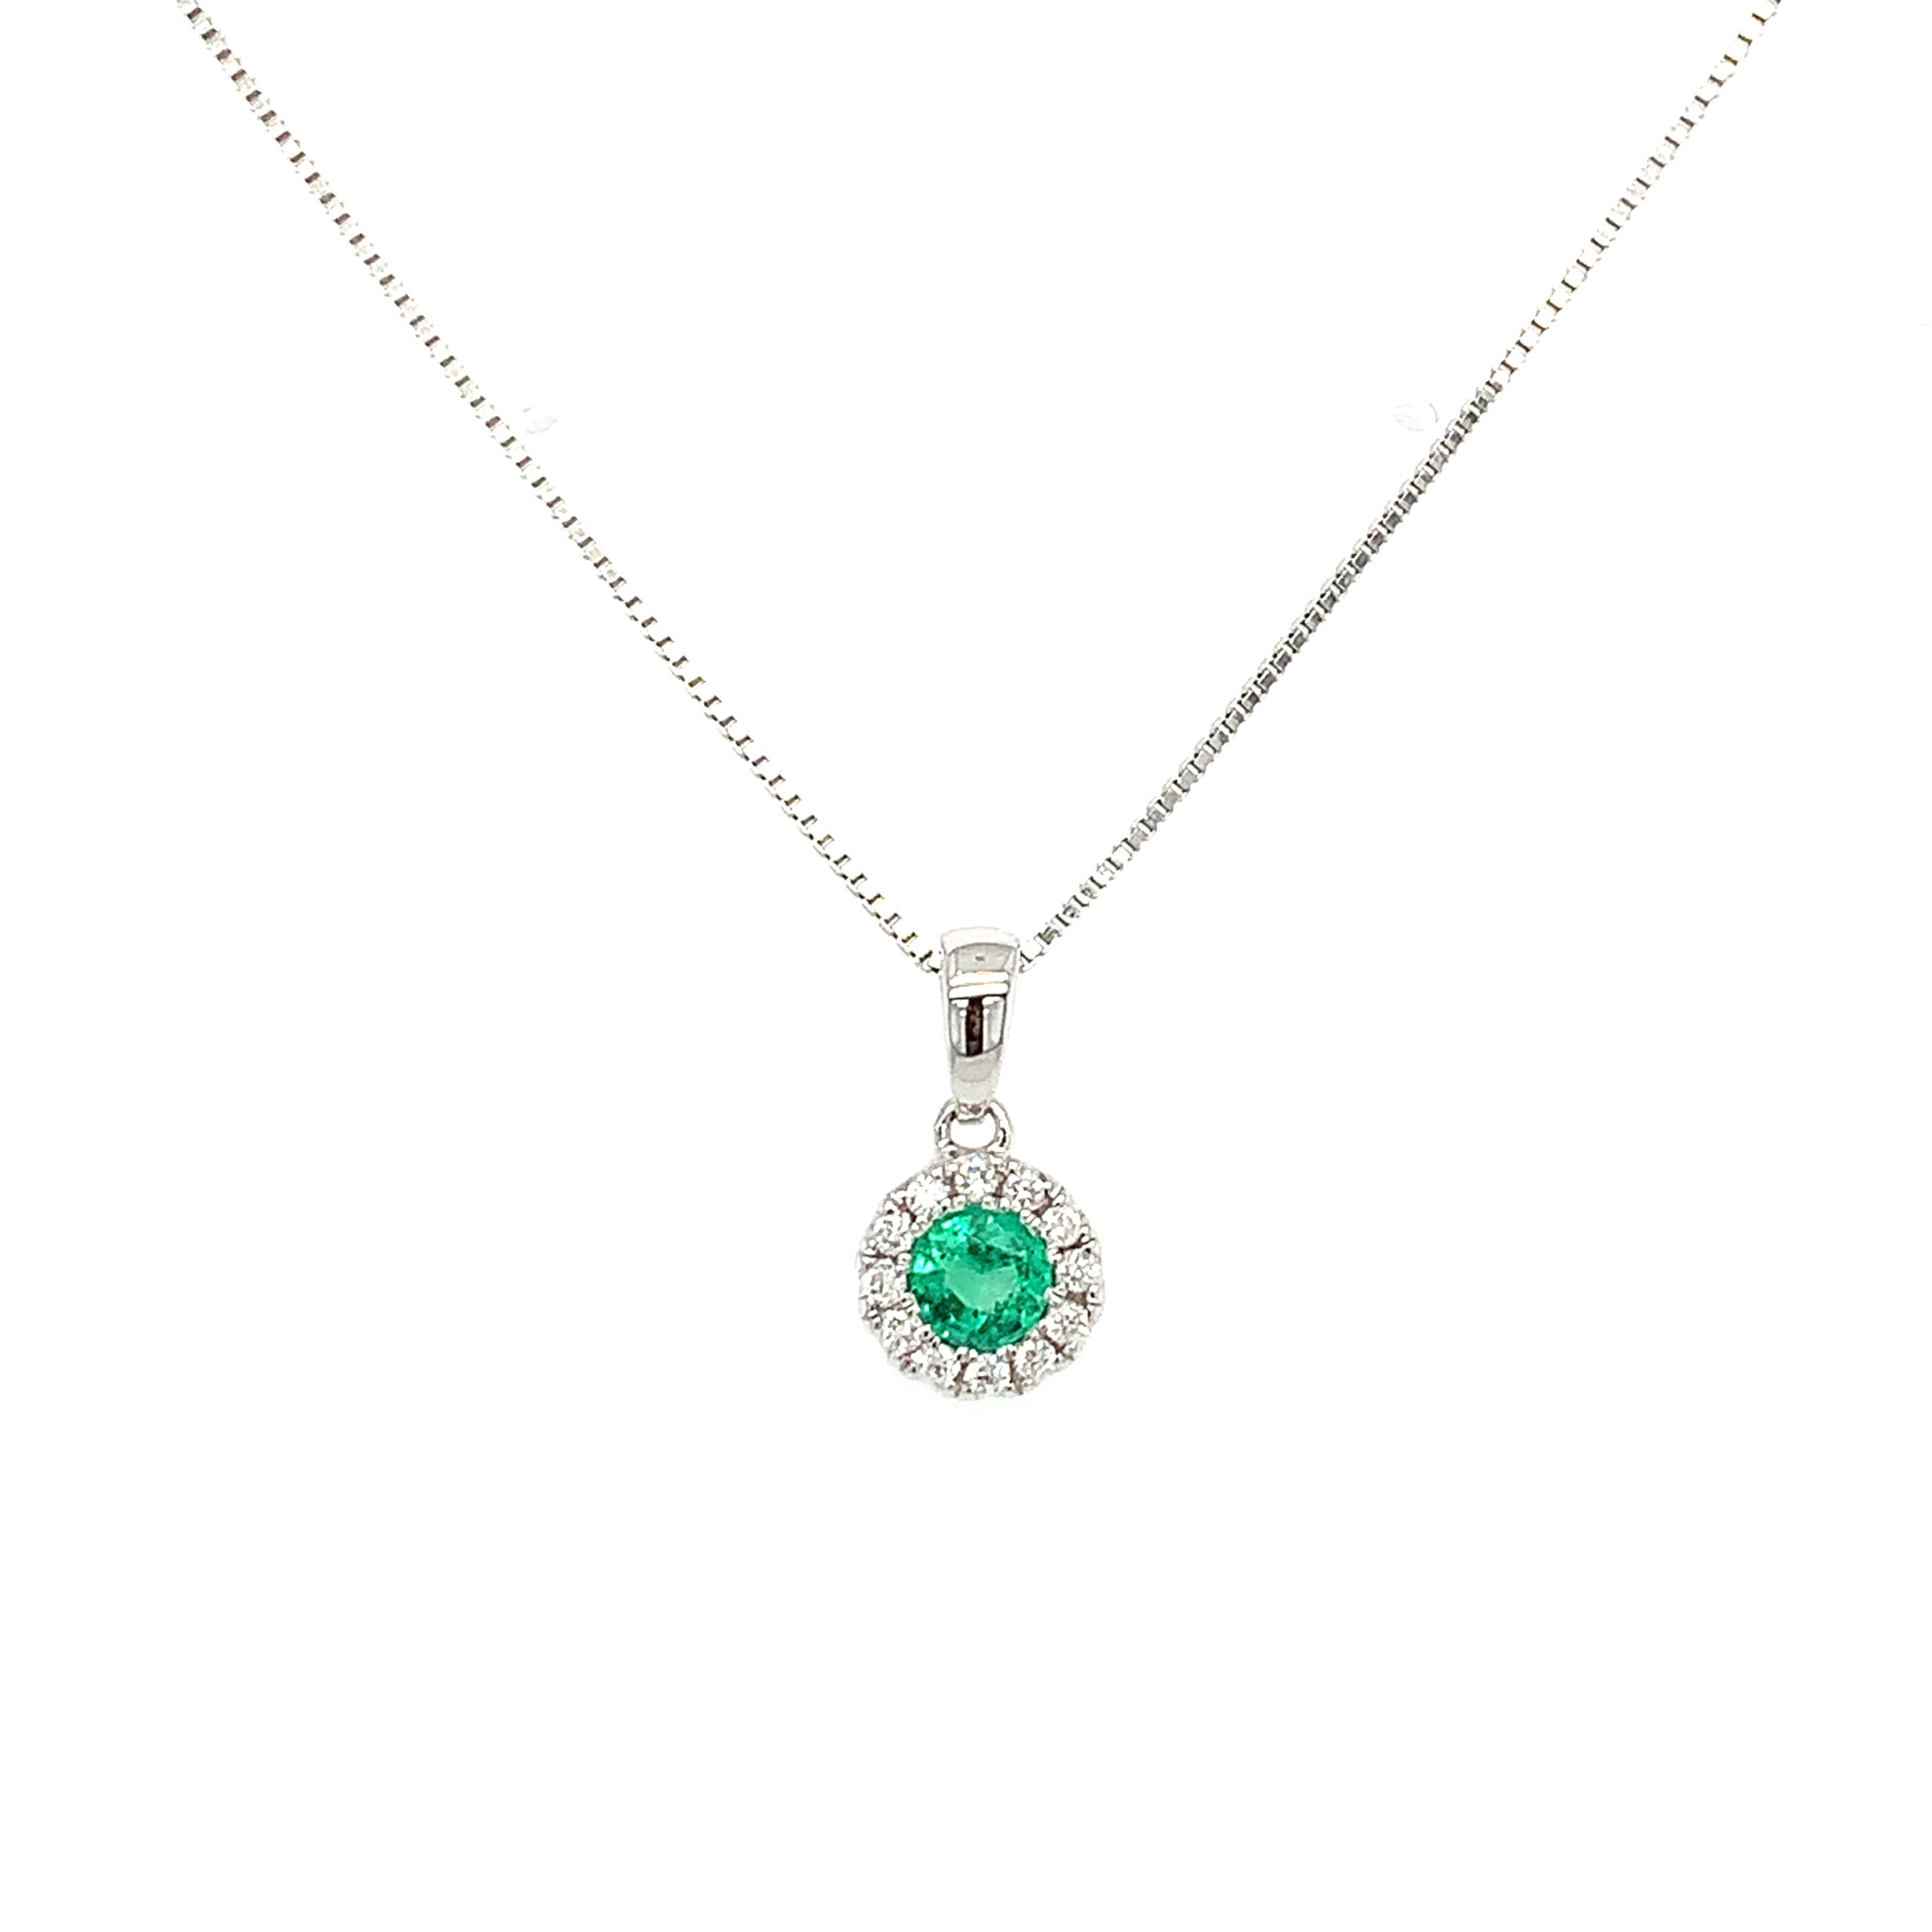 White Gold Emerald Pendant Necklace